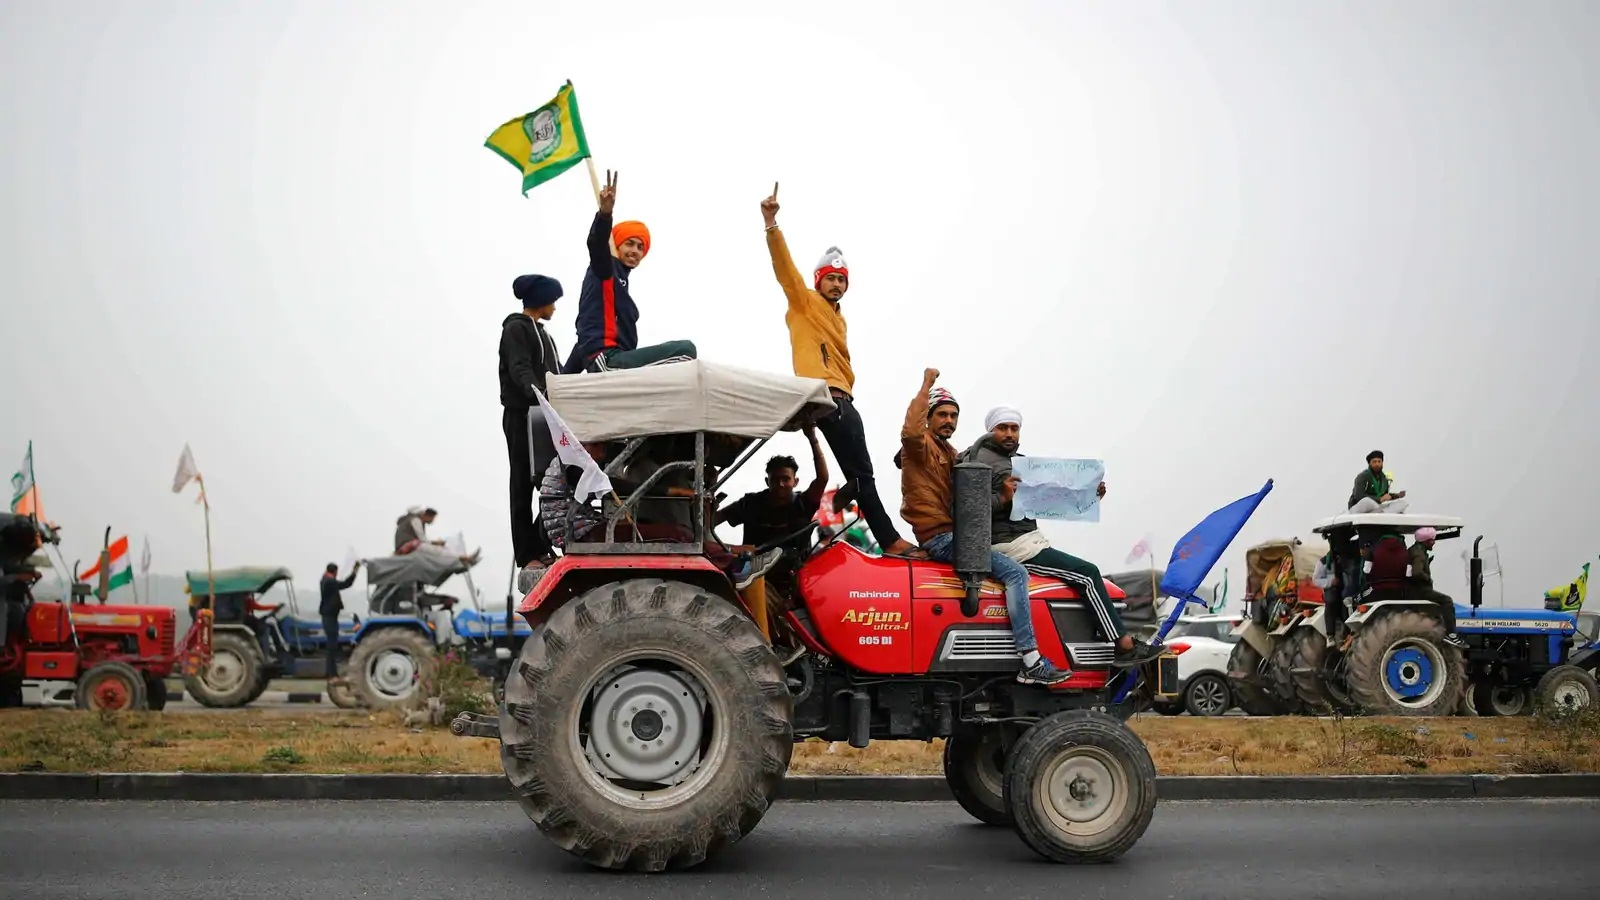 ट्रॅक्टर रॅलीः पोलिस-शेतकरी संघटनांची बैठक निष्फळ